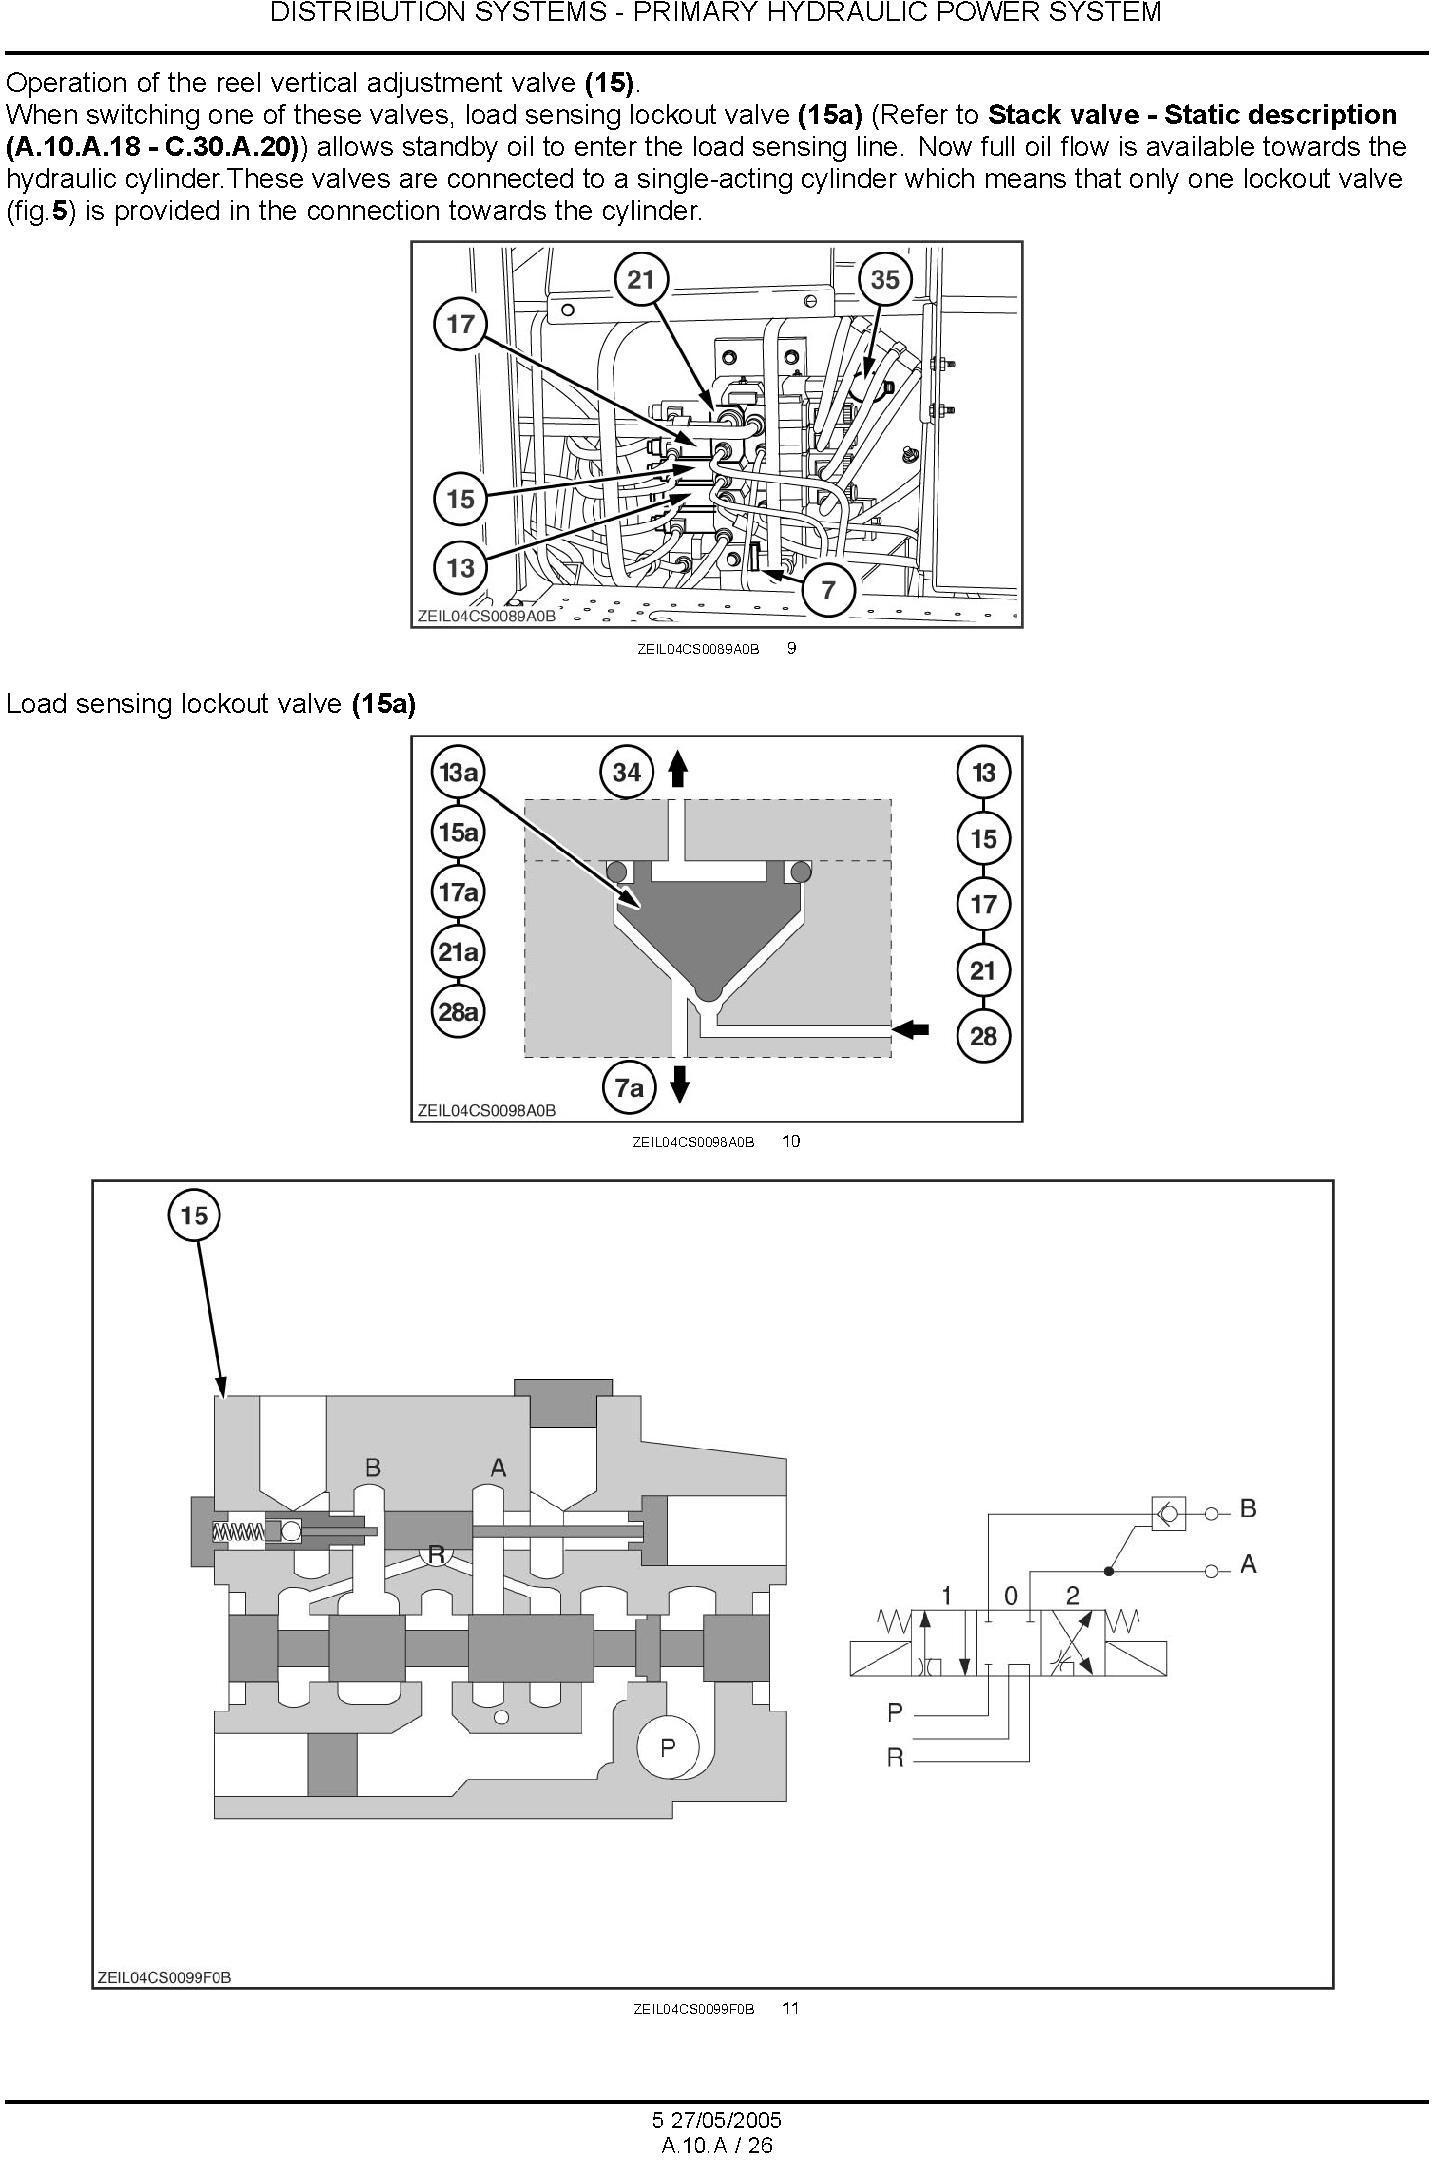 New Holland CS520, CS540, CS640, CS660, CL560 Combine Service Manual - 2